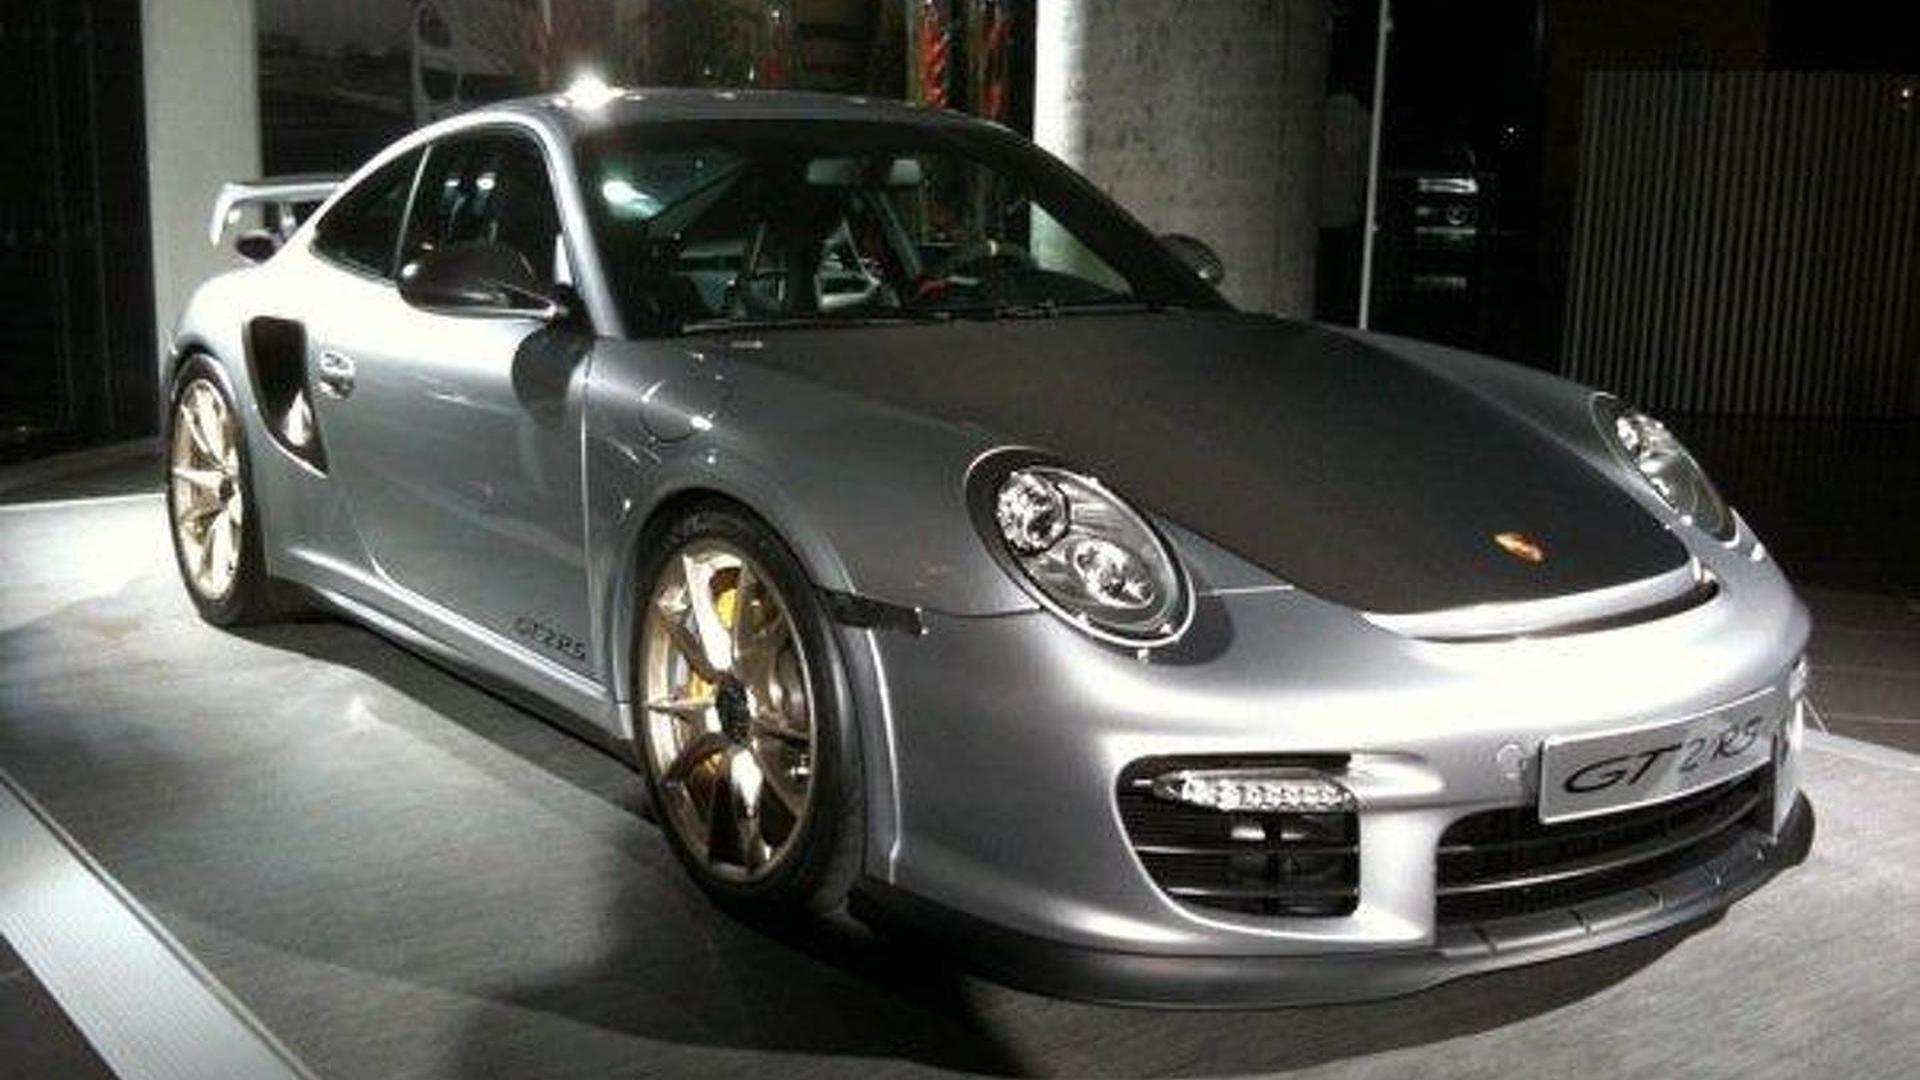 2010-201265-2011-porsche-911-gt2-rs1 Cool Porsche 911 Gt2 Price India Cars Trend